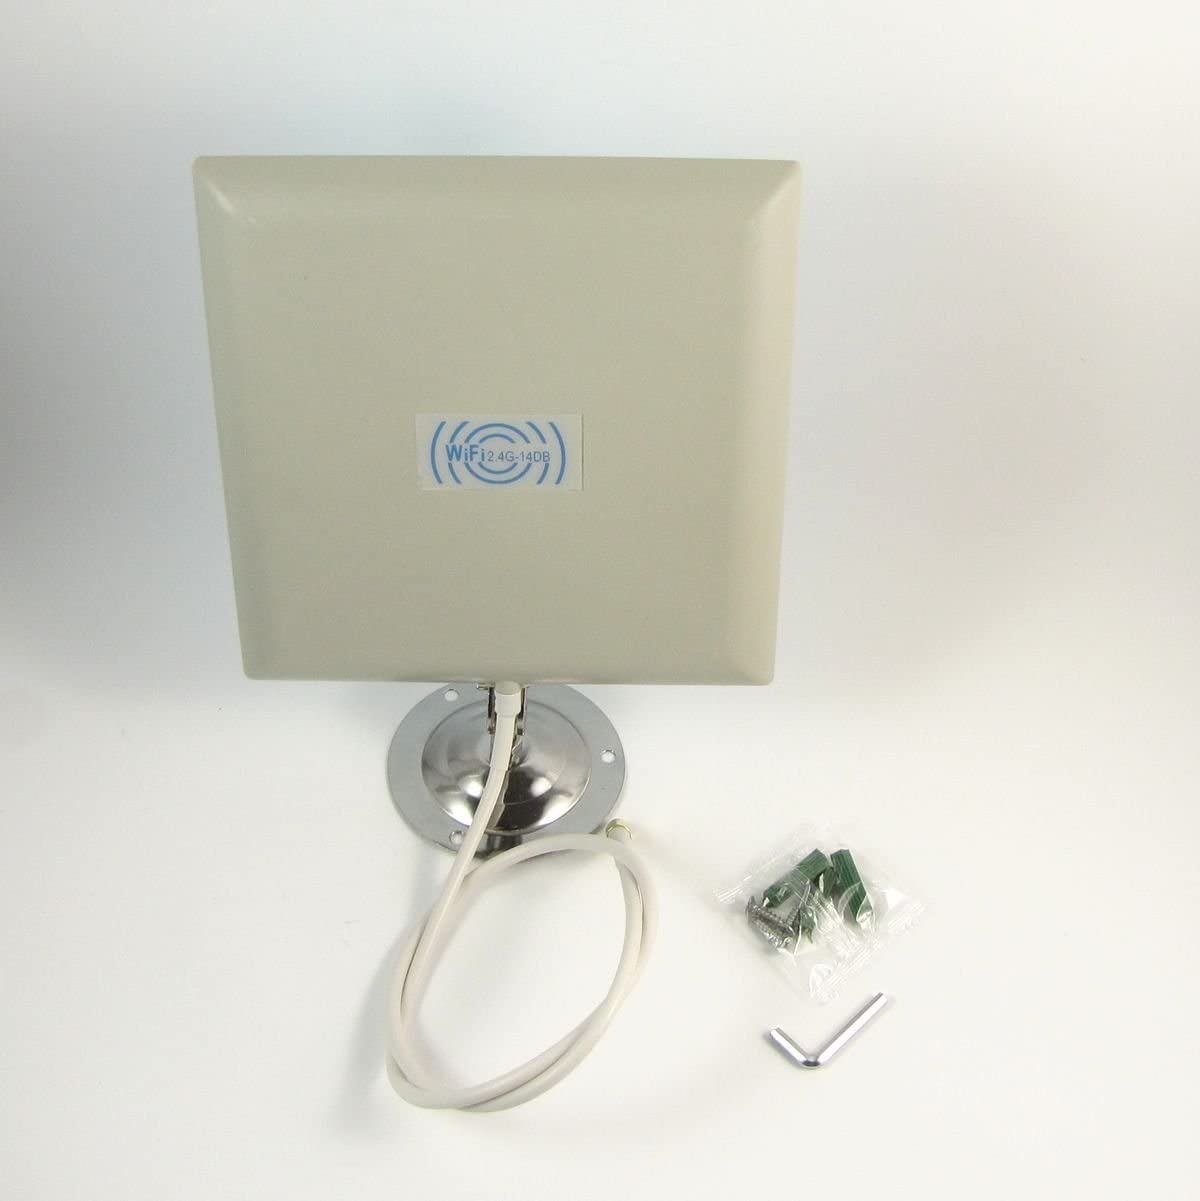 2.4GHz 14dbi direccional antena plana WiFi del router inalámbrico al aire libre de interior